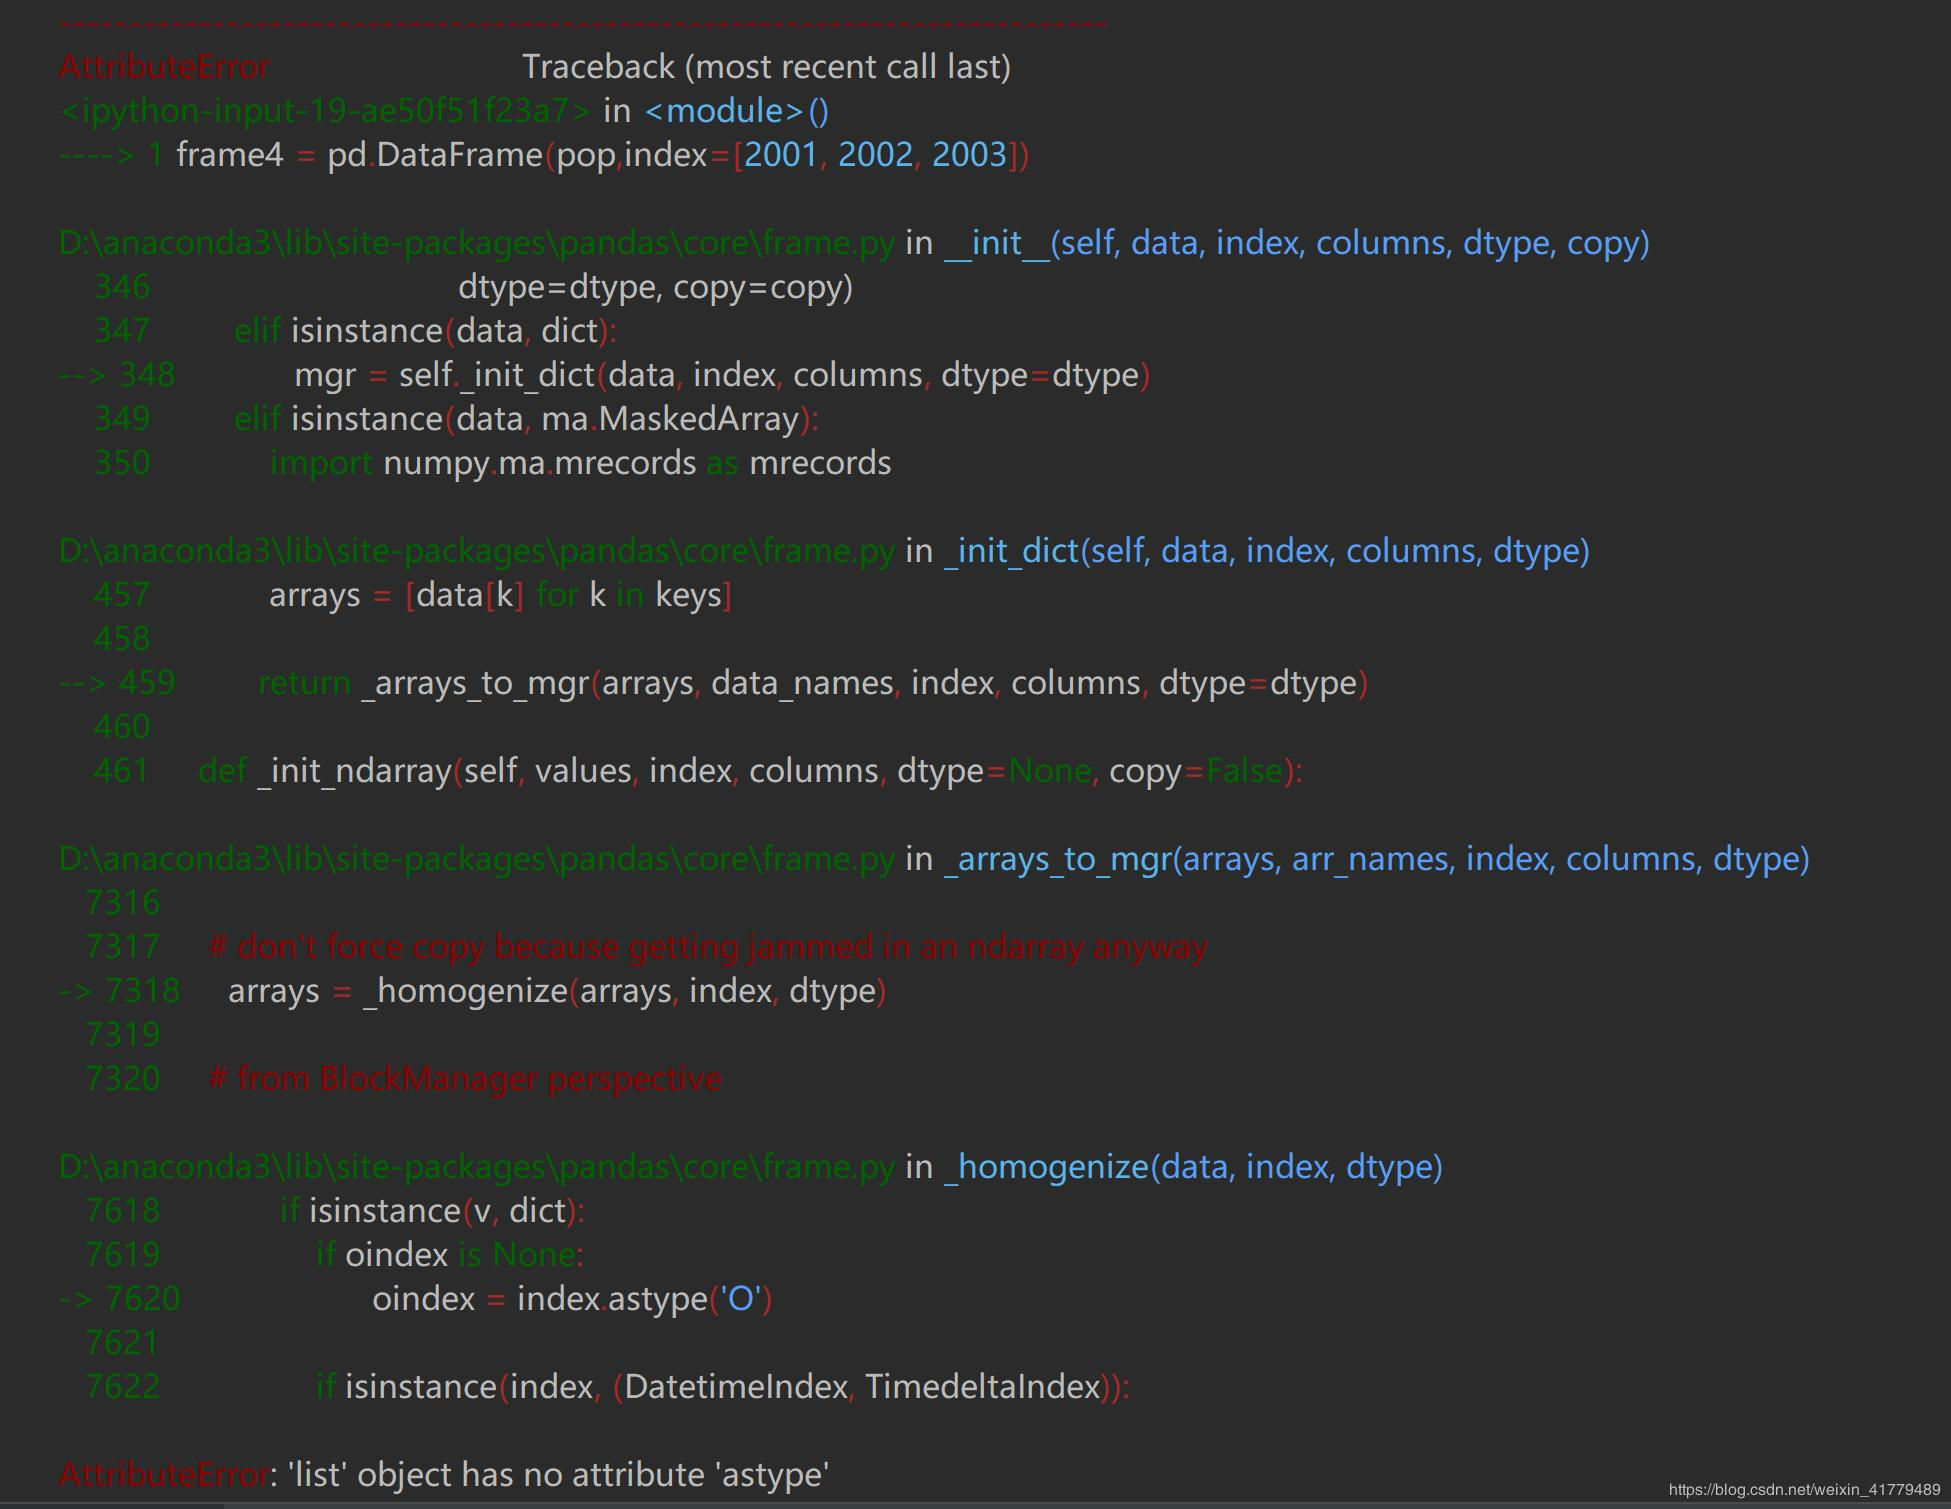 Pandas has encountered an error using DataFrame: AttributeError